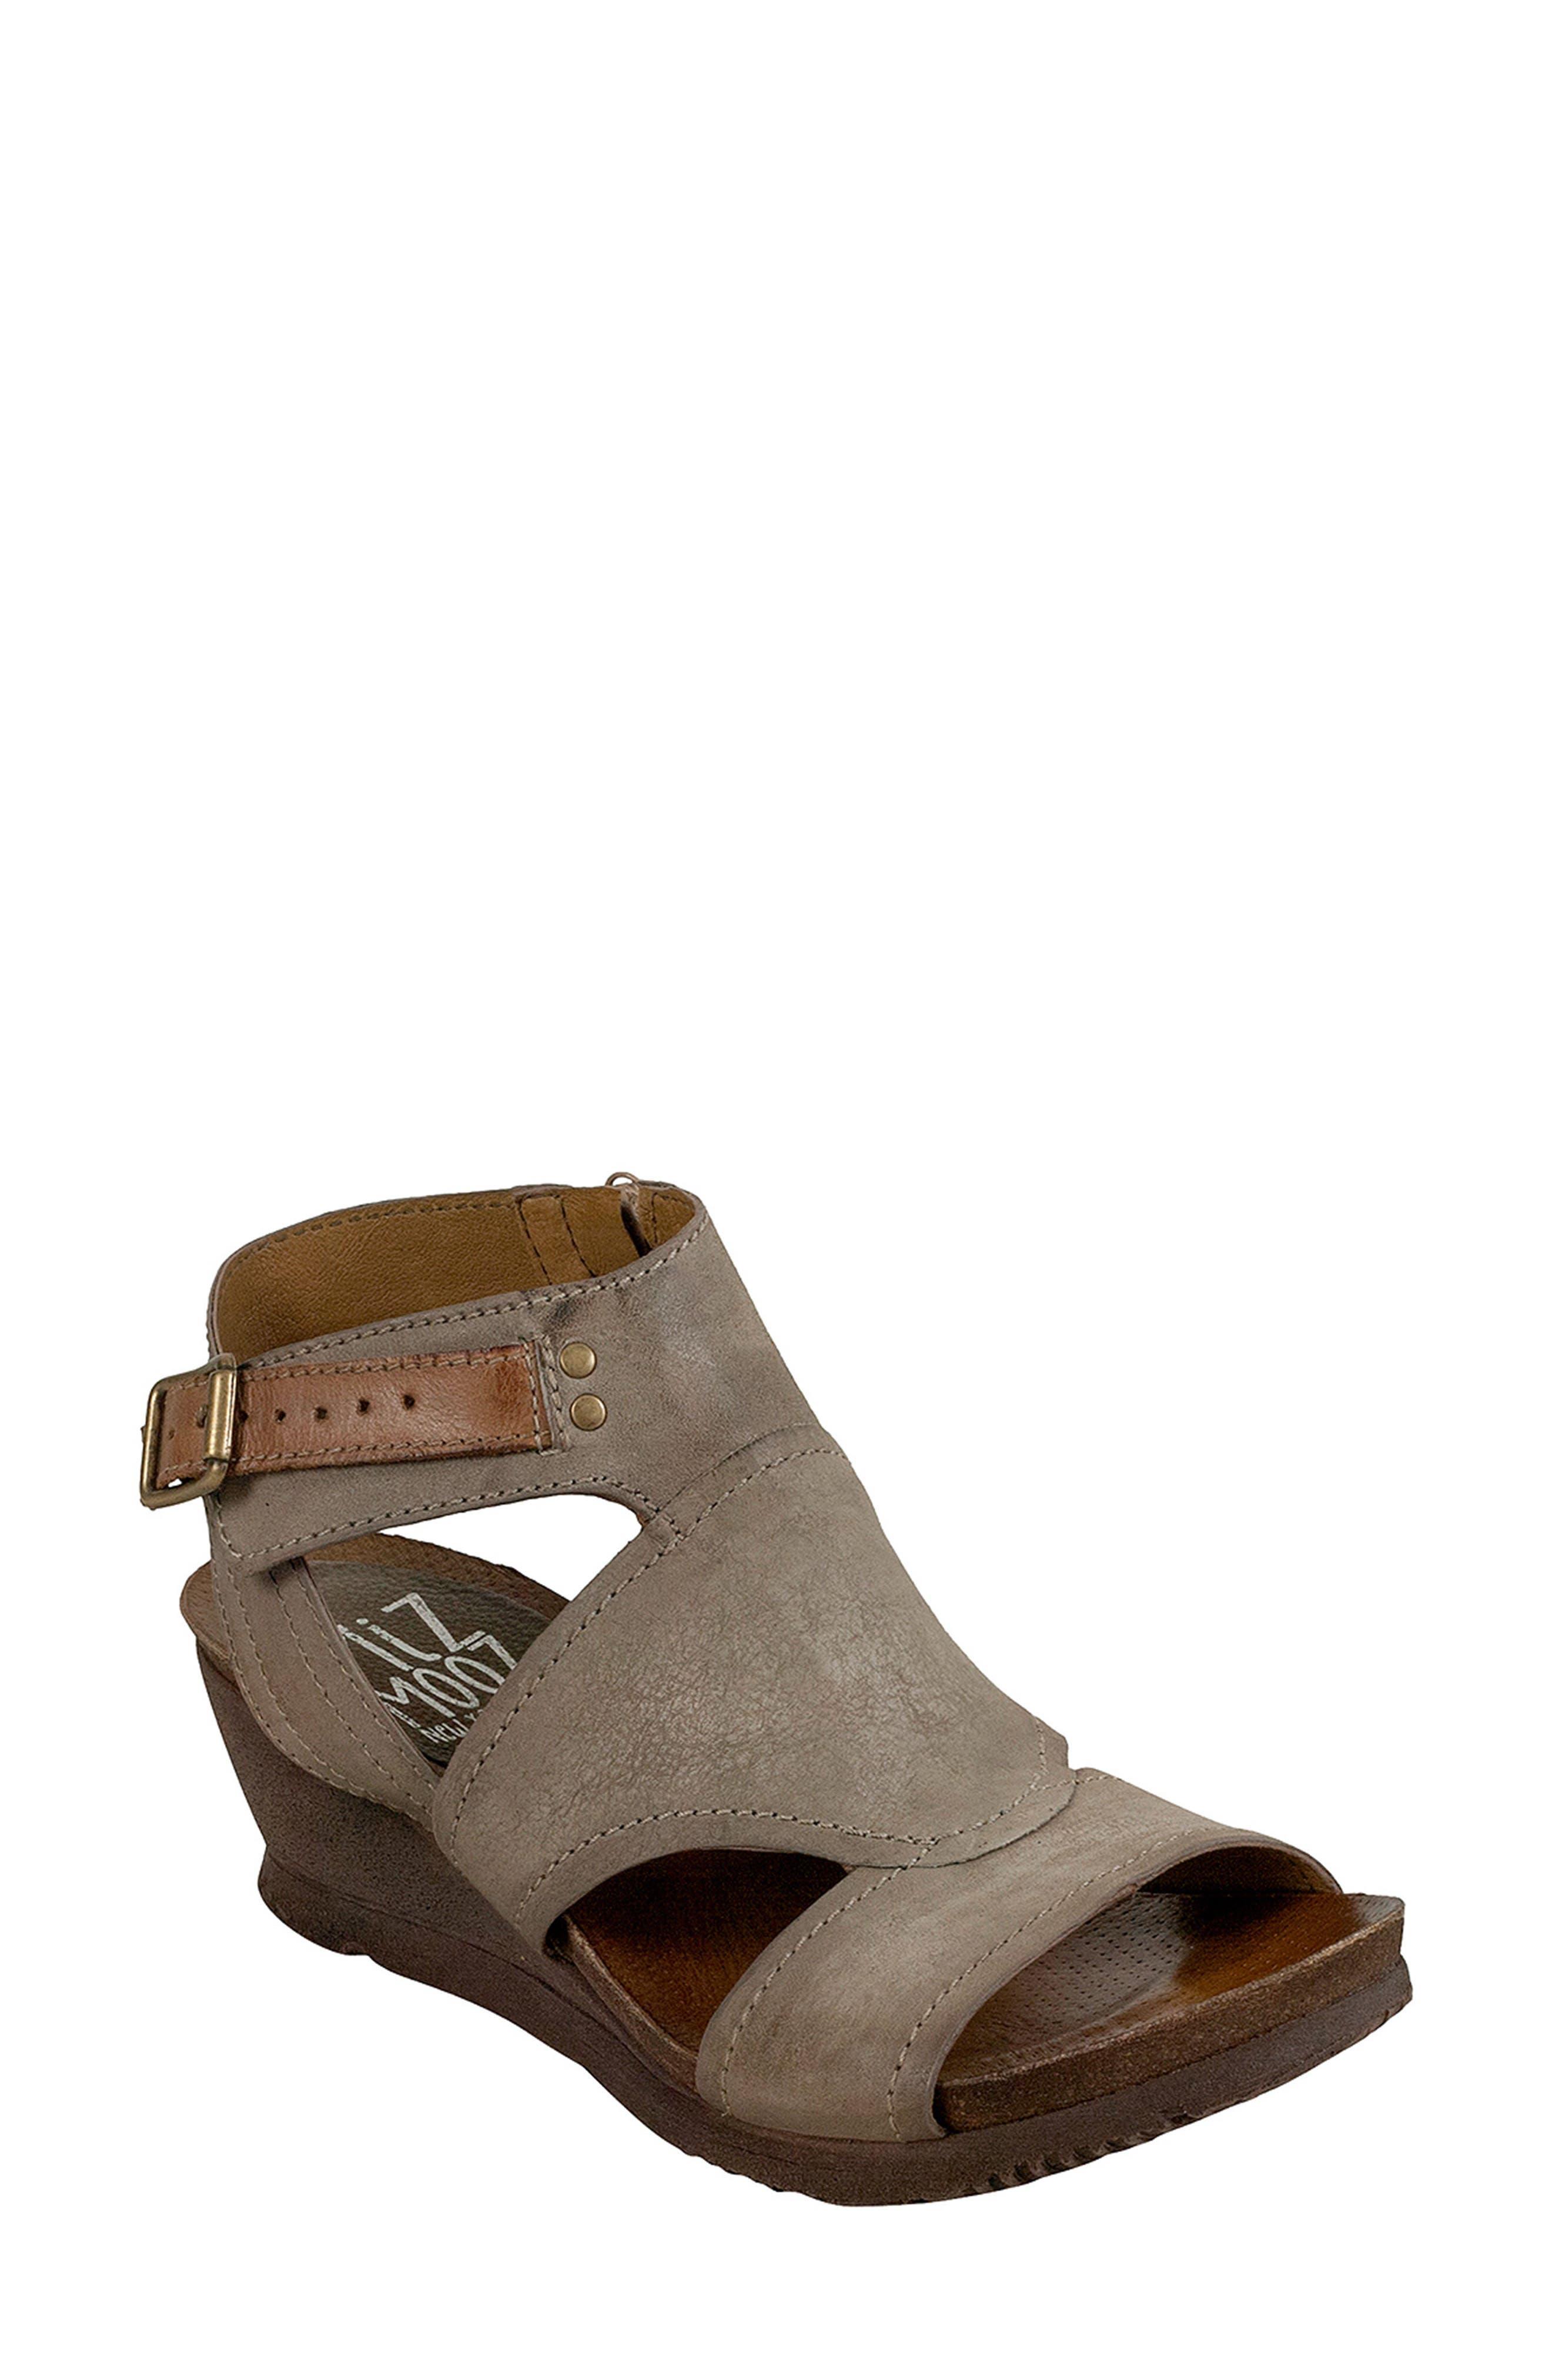 Scout Wedge Sandal,                             Main thumbnail 1, color,                             Pebble Leather